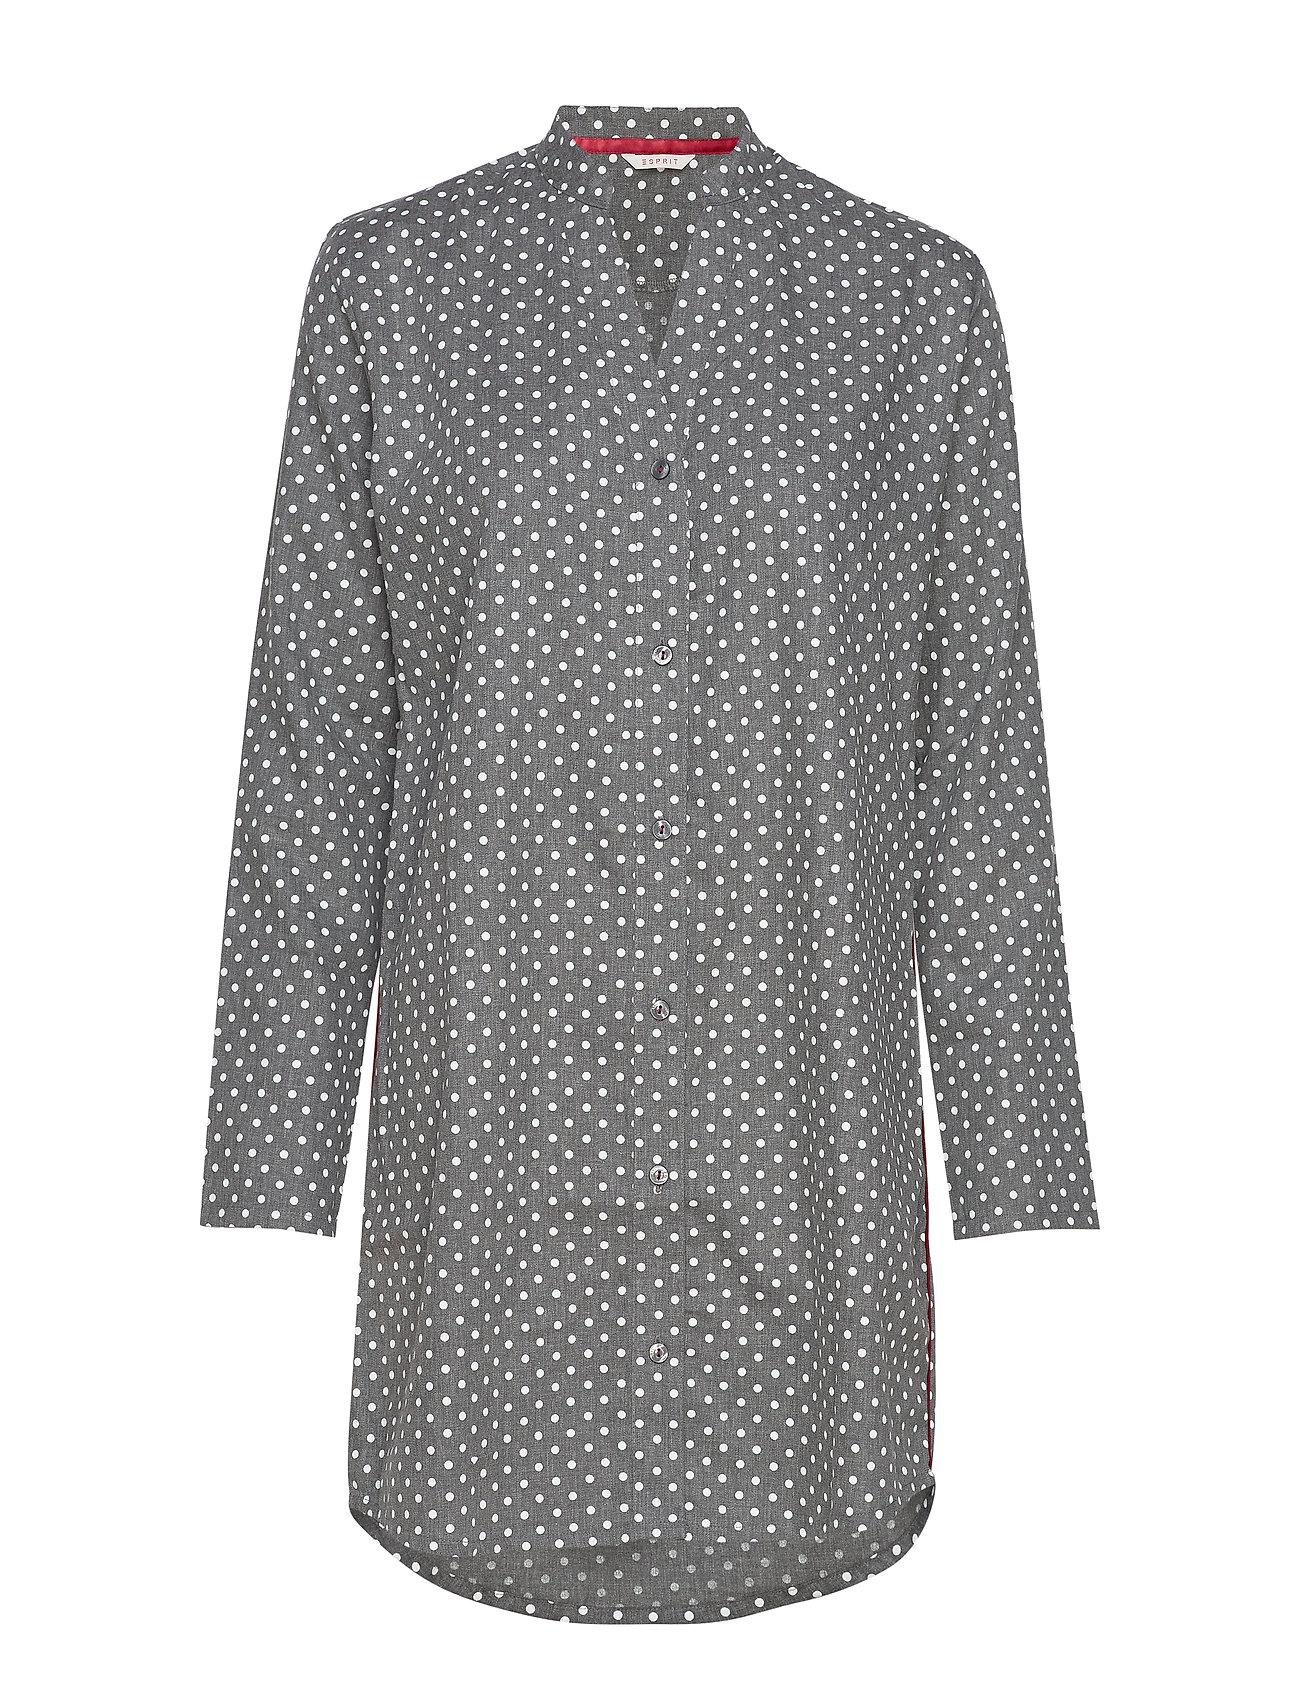 Image of Nightshirts Nattøj Grå Esprit Bodywear Women (3246473957)